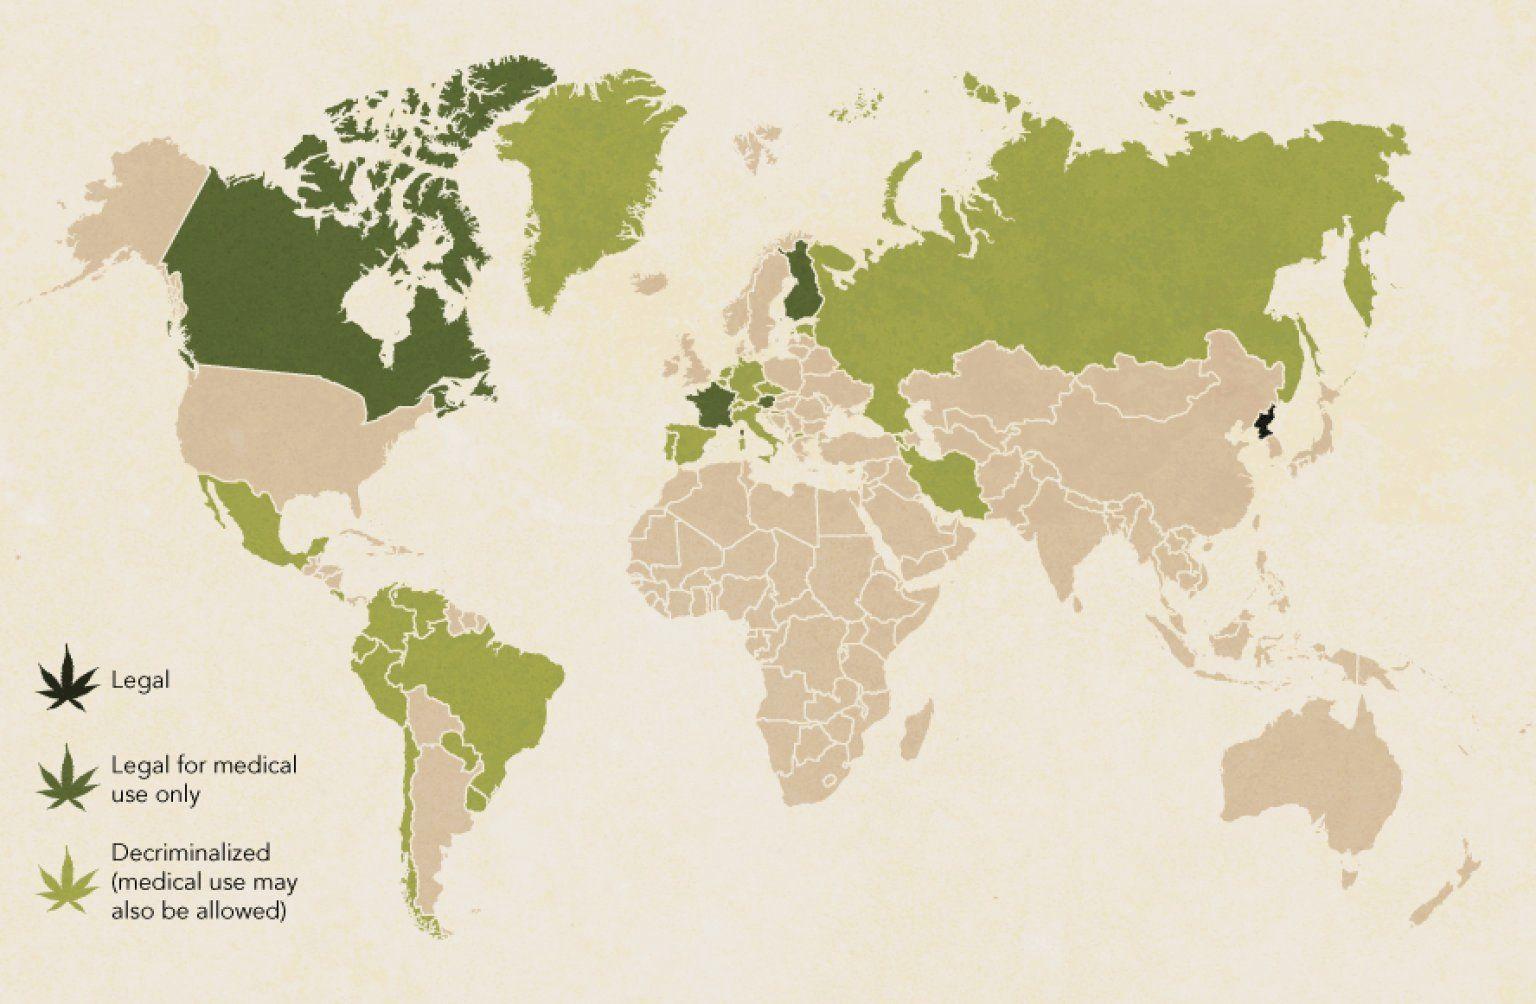 LOOK: Where In The World Can You Smoke Marijuana?